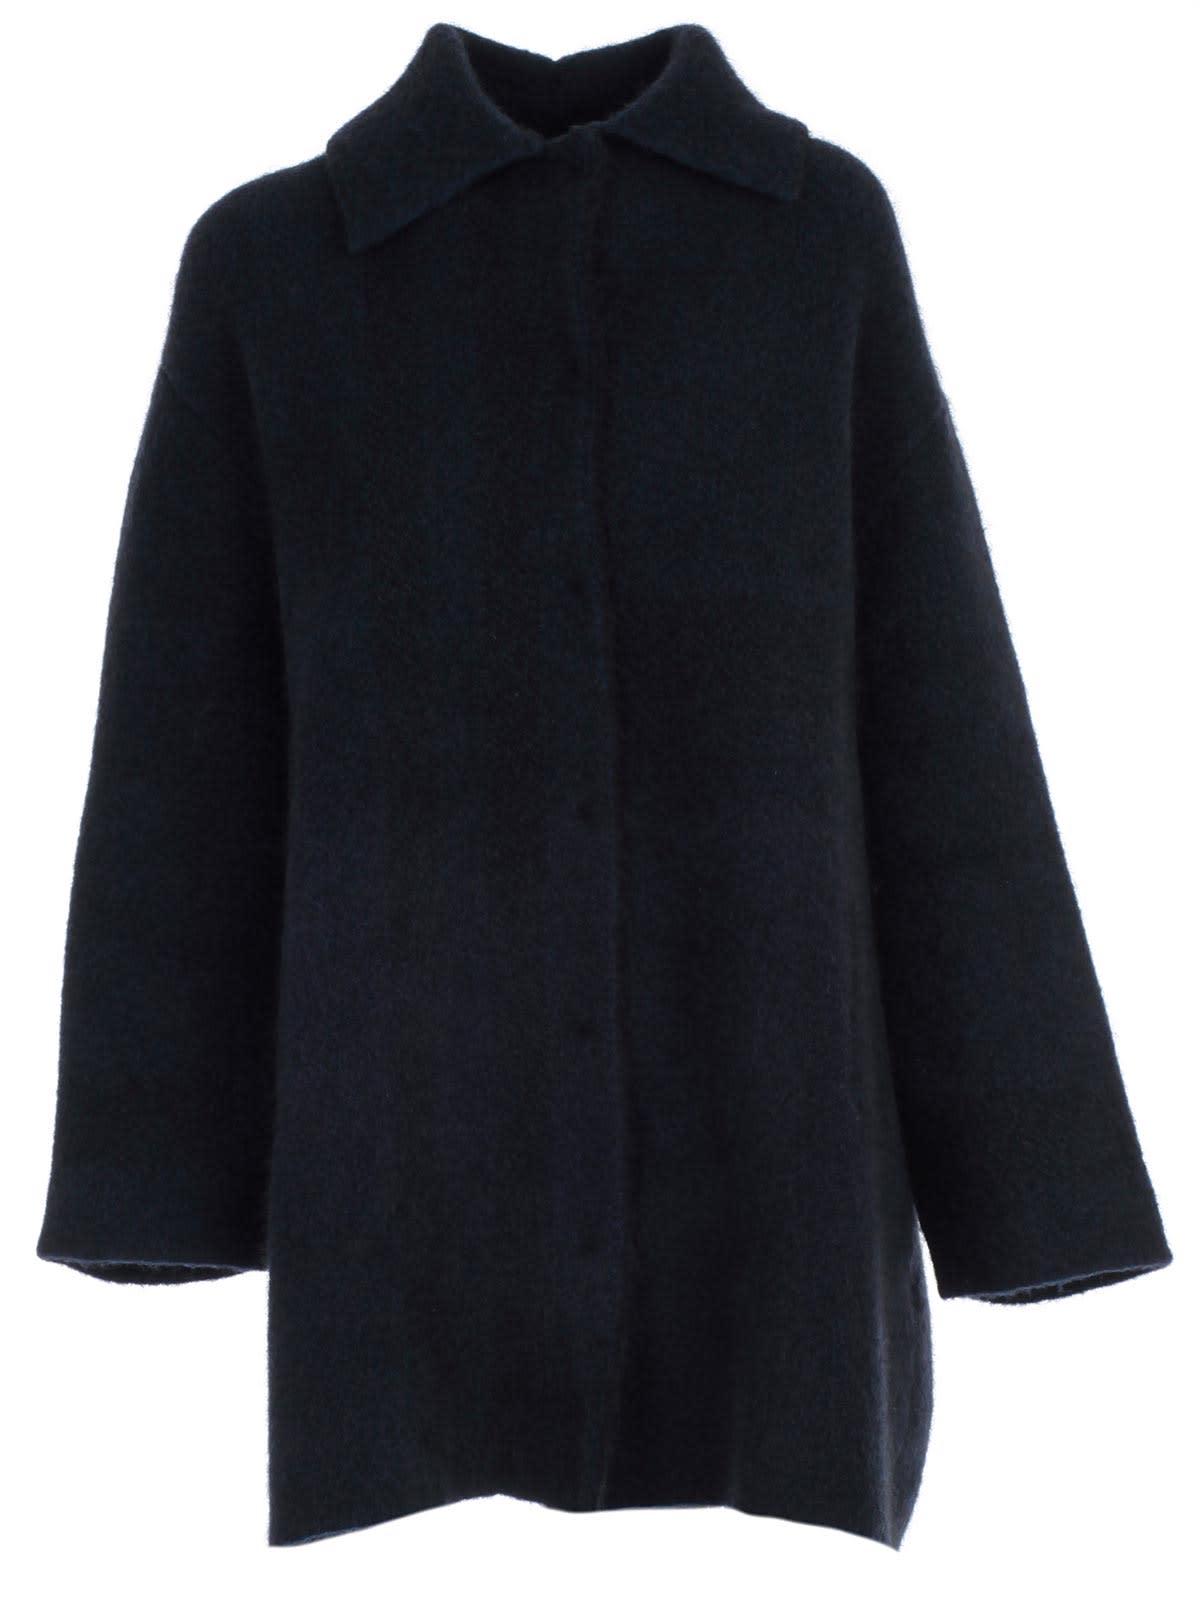 Boboutic Coat Over Shirt Collar